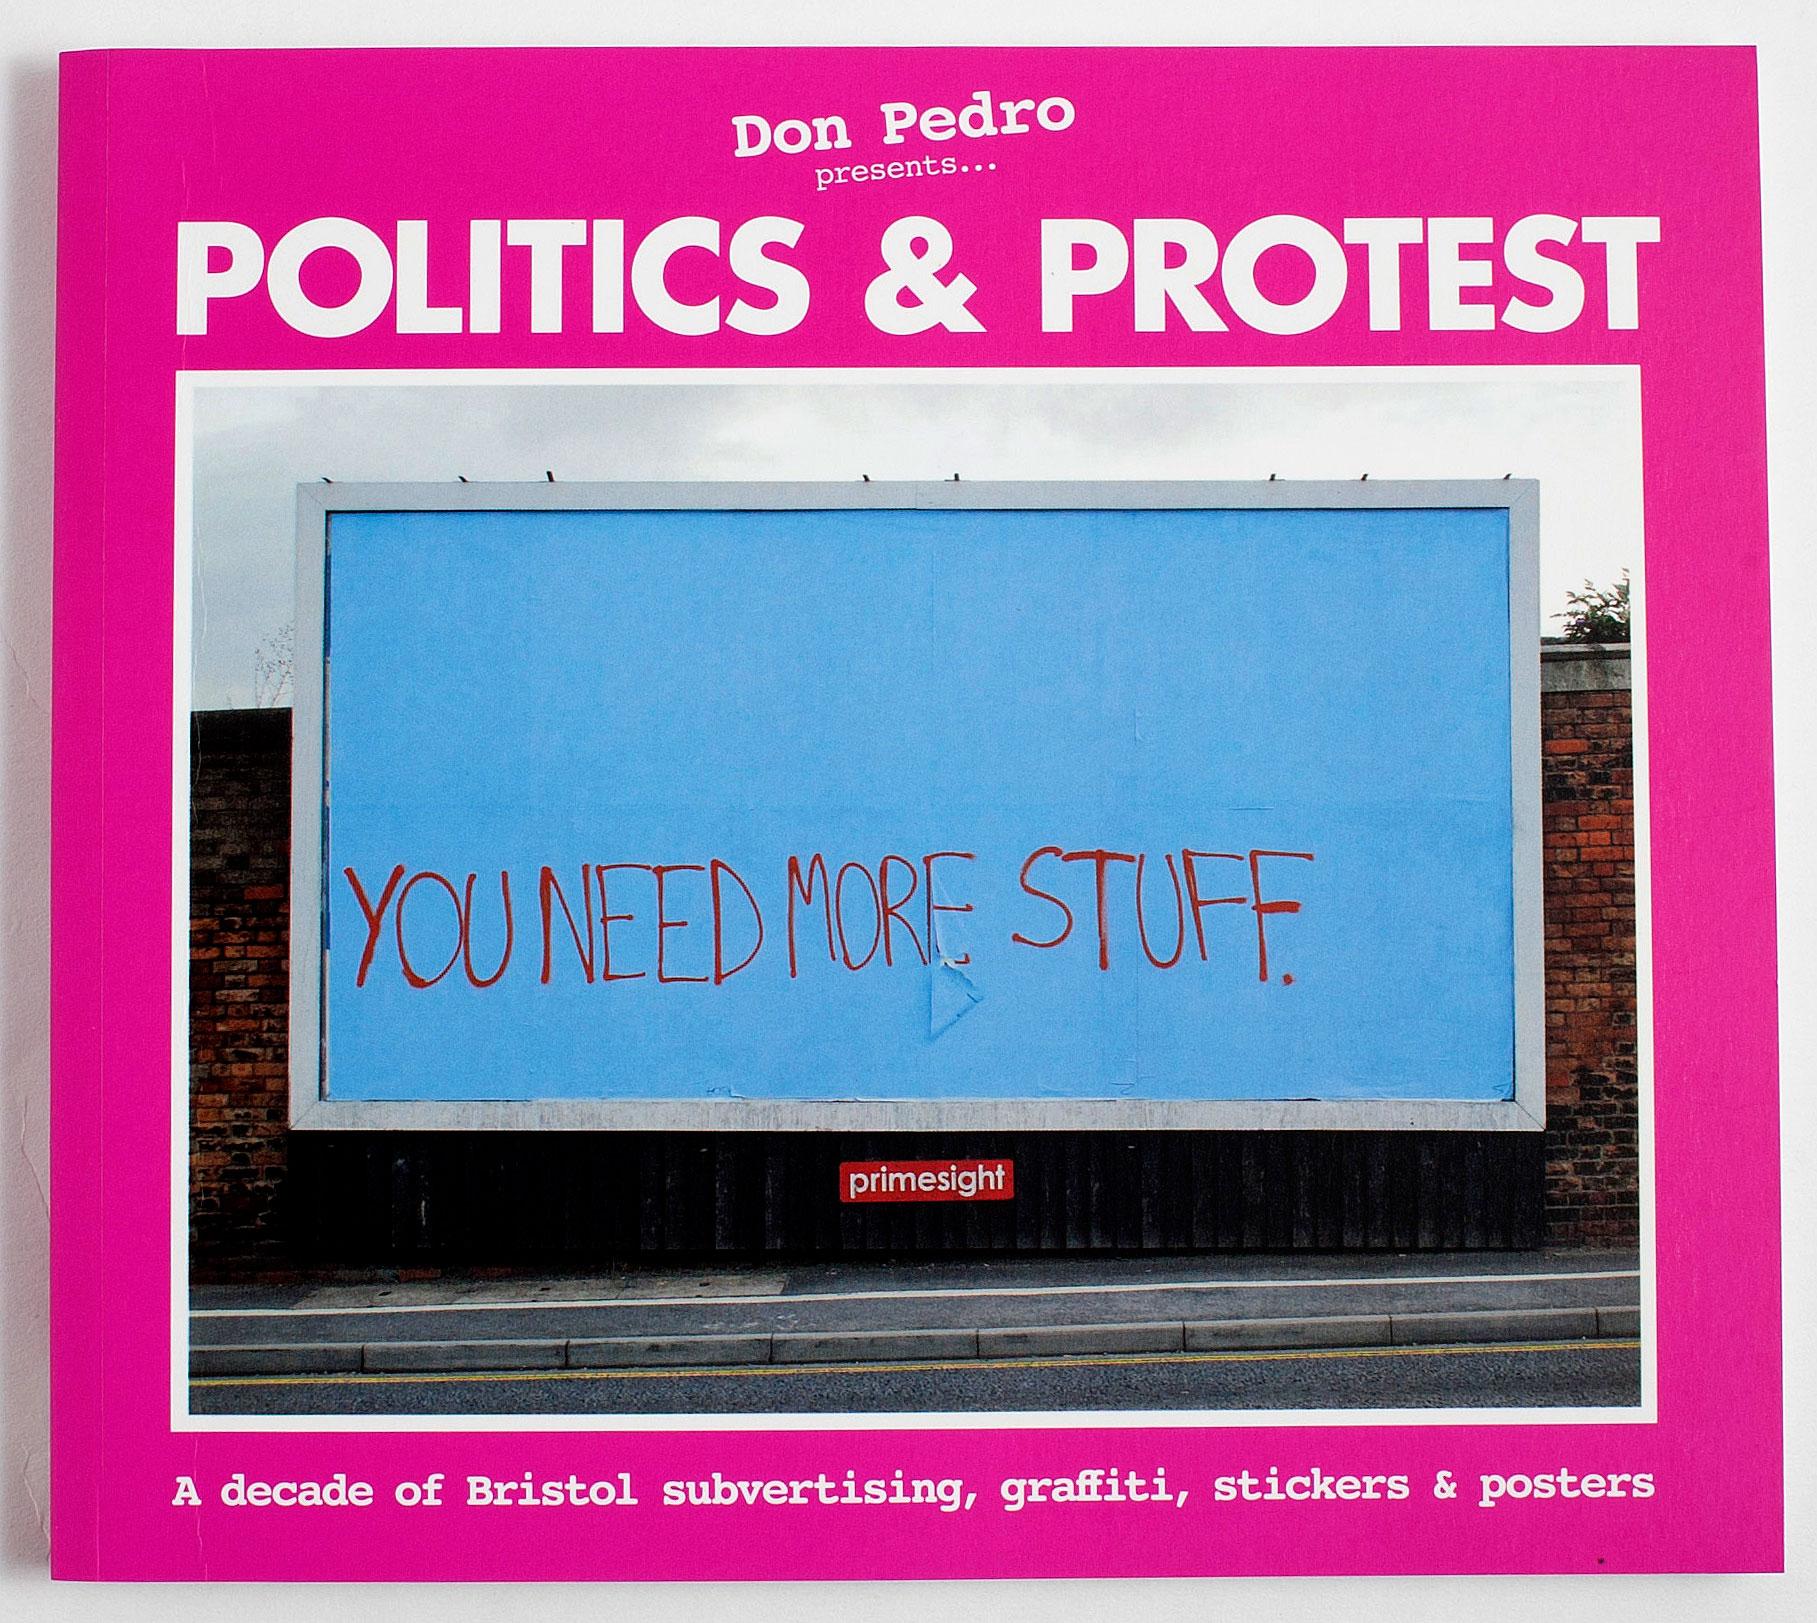 epm-print-management-political-books-don-pedro-2.jpg